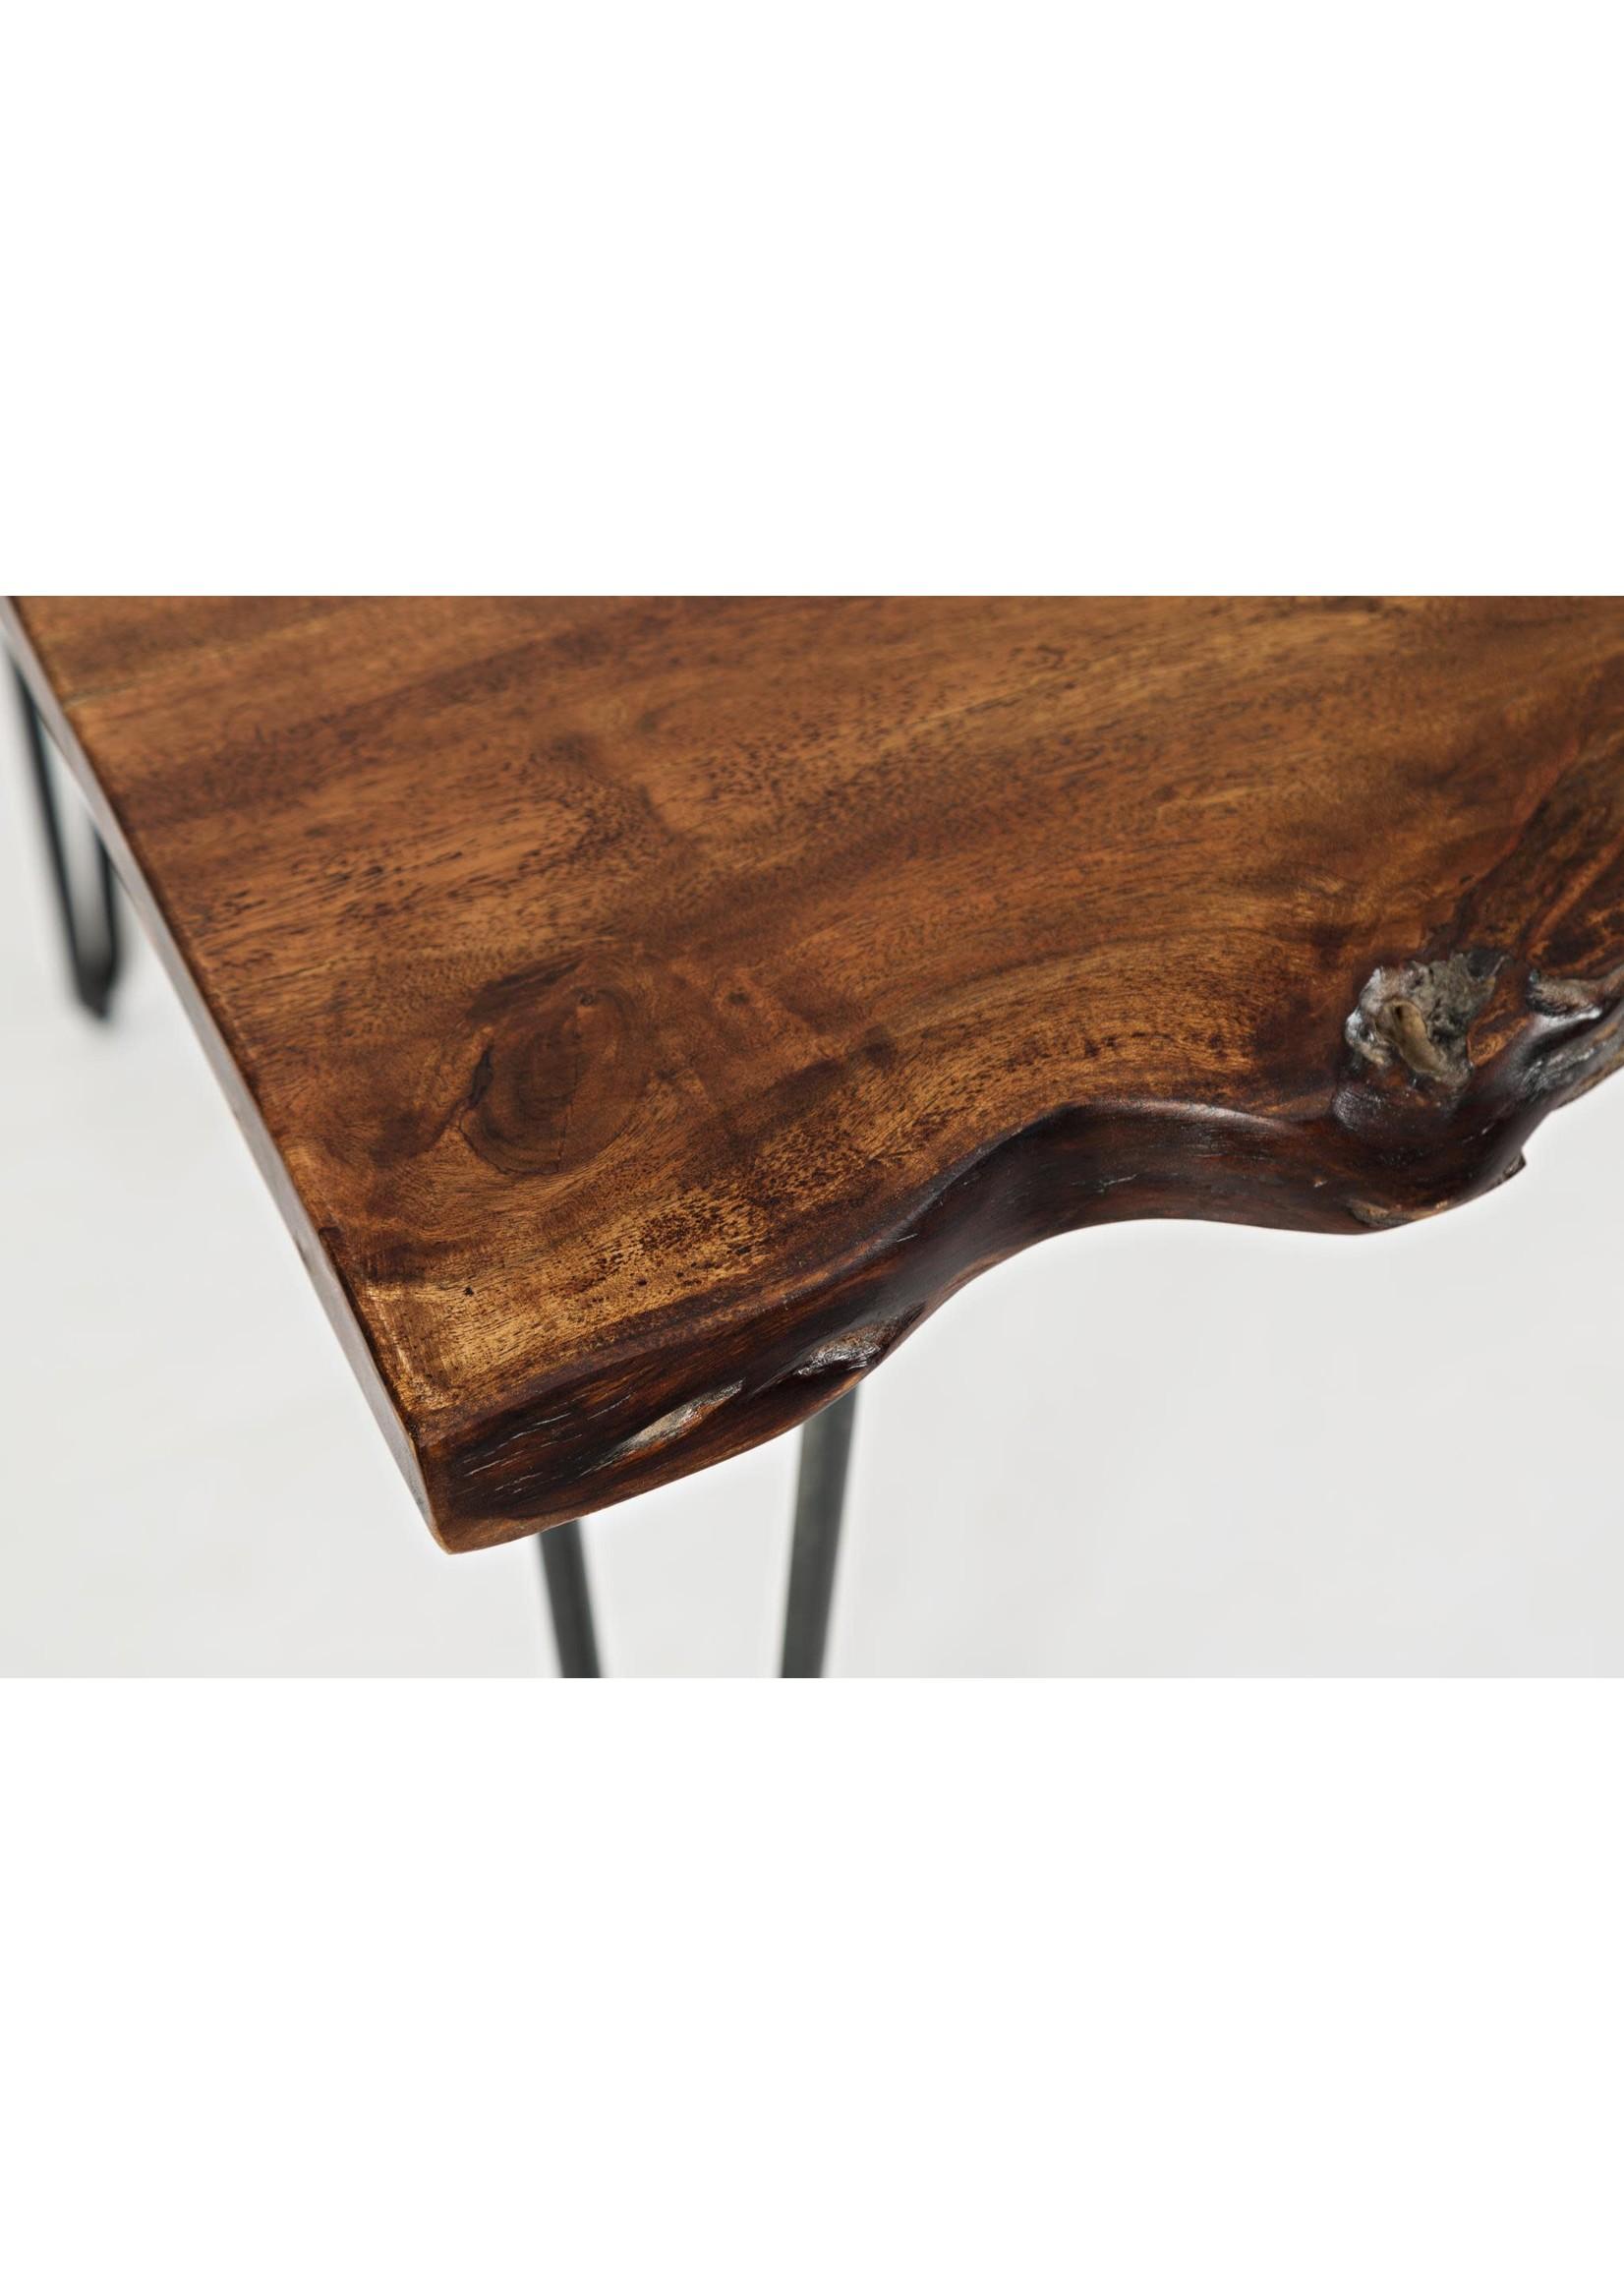 New Chestnut 60 Inch Dining Table JO 1781-60